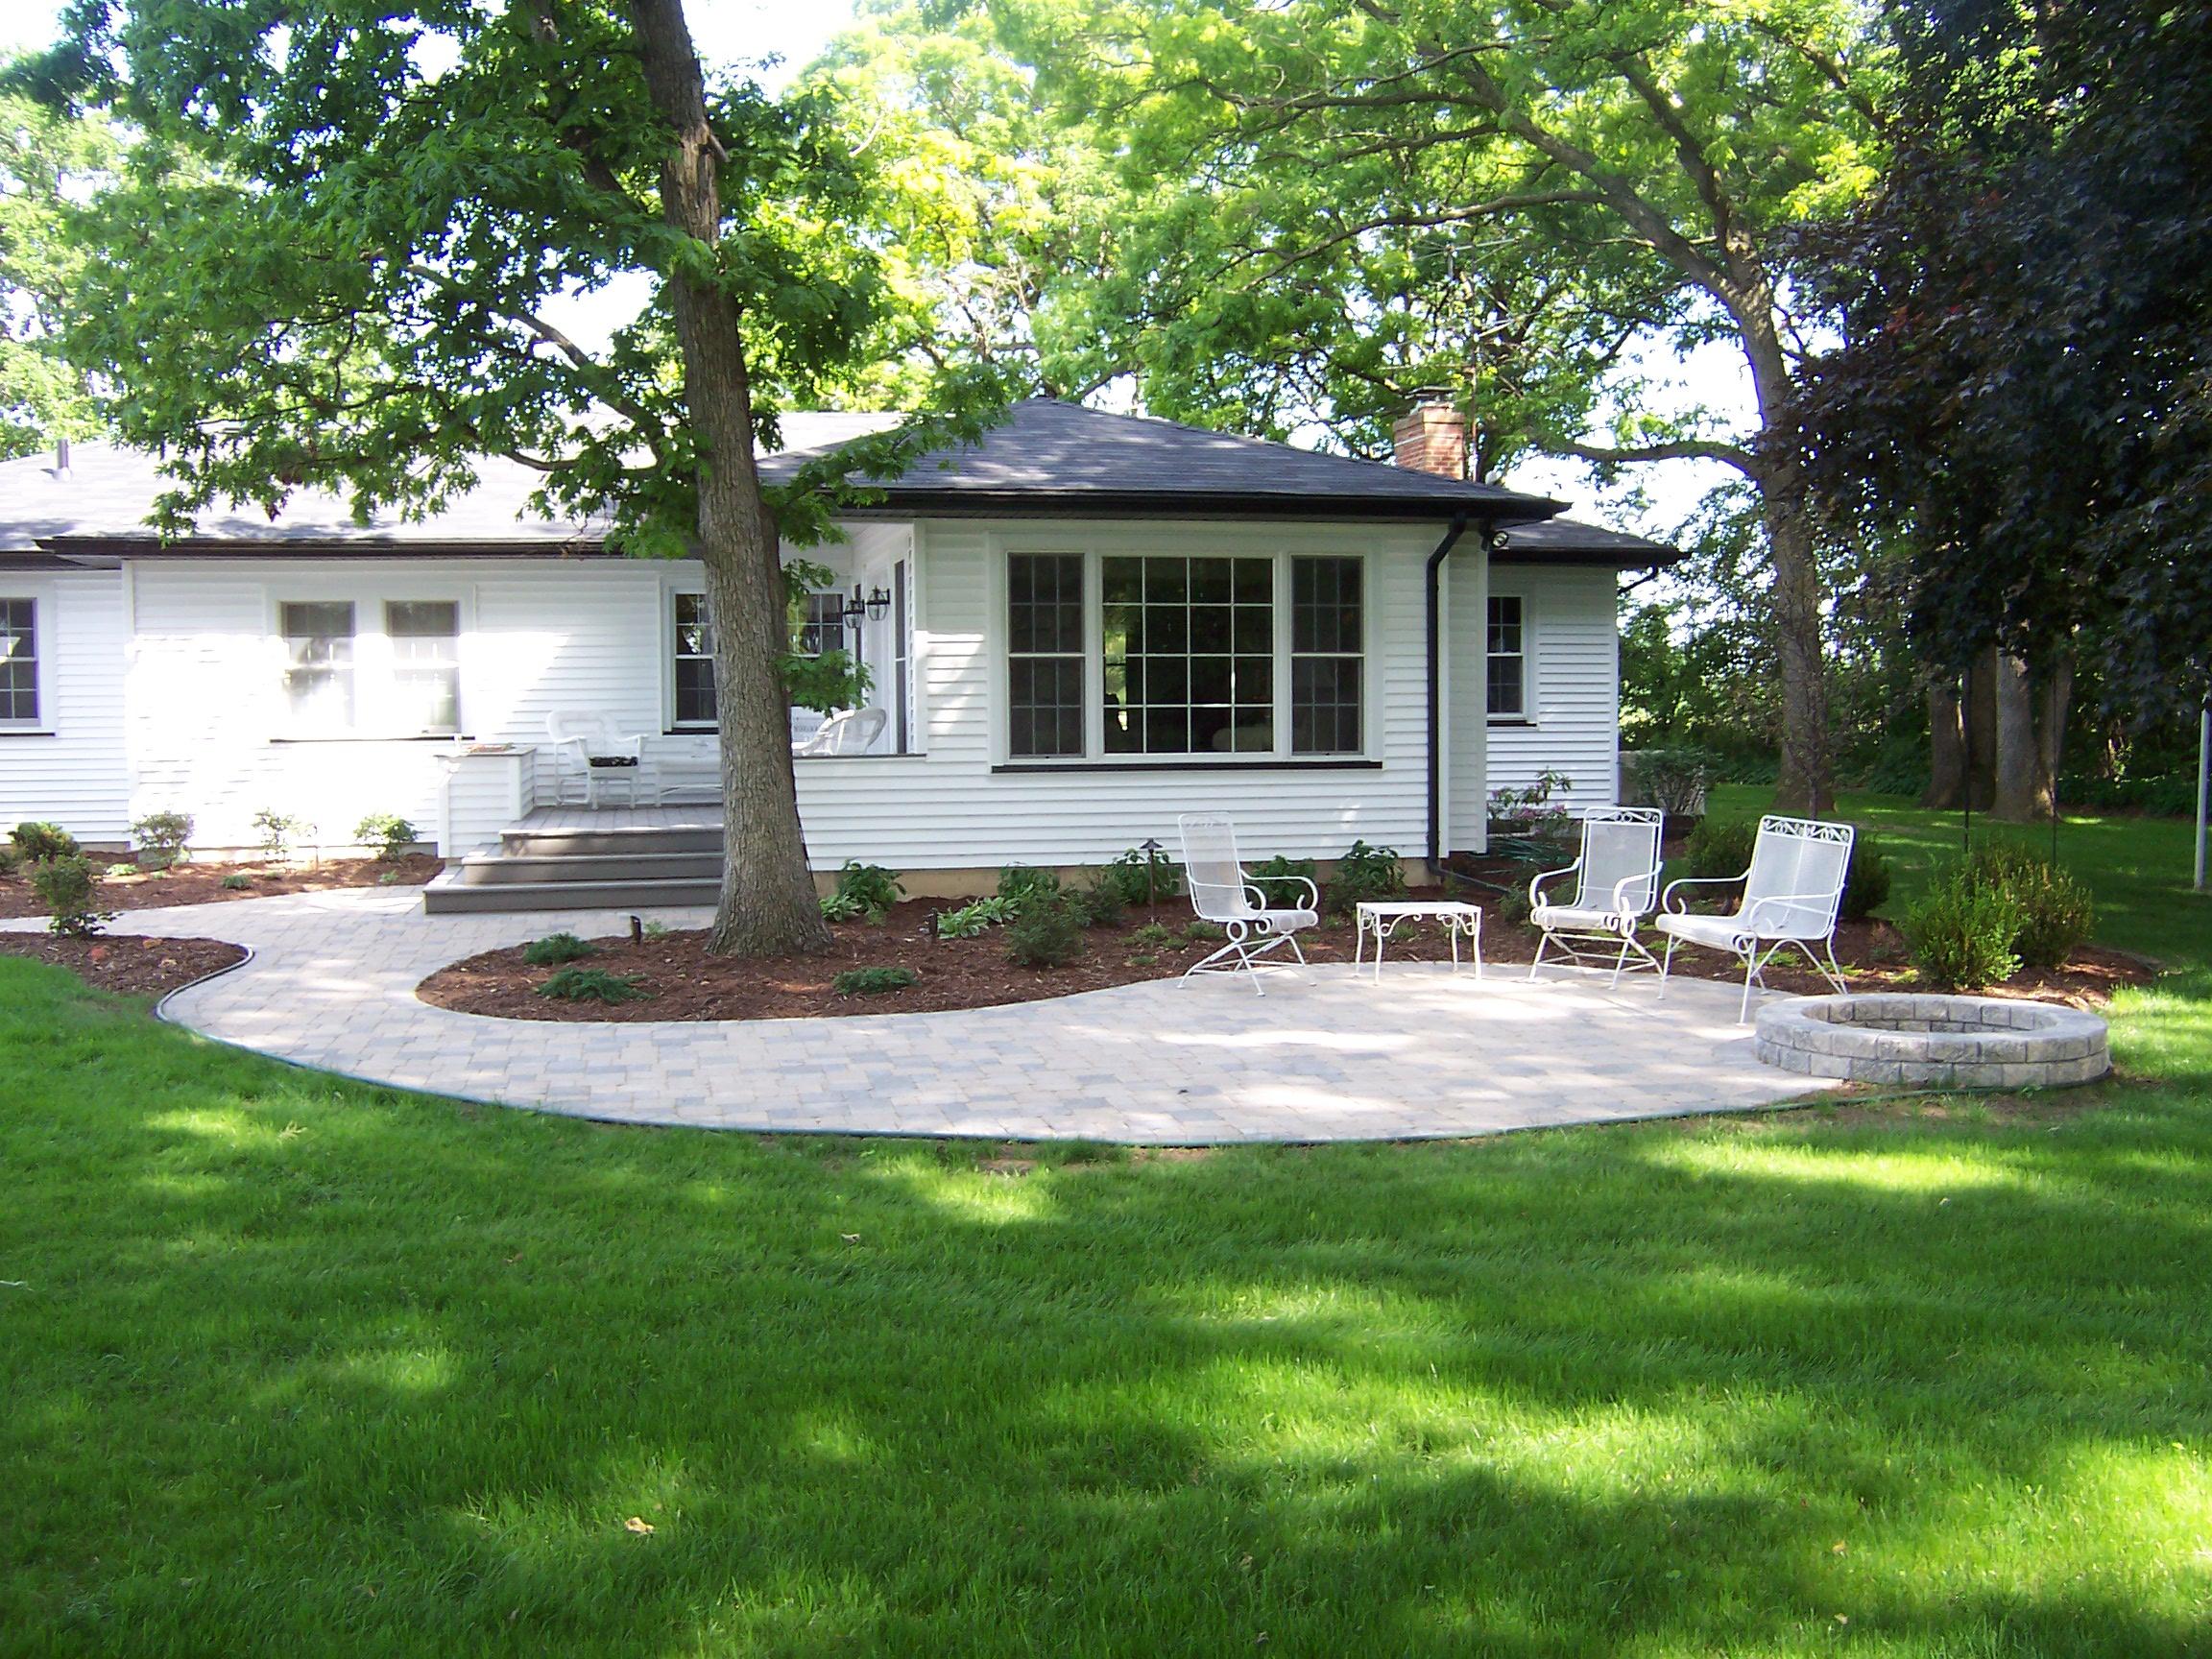 Residential landscape design hanson landscape for Residential landscaping ideas